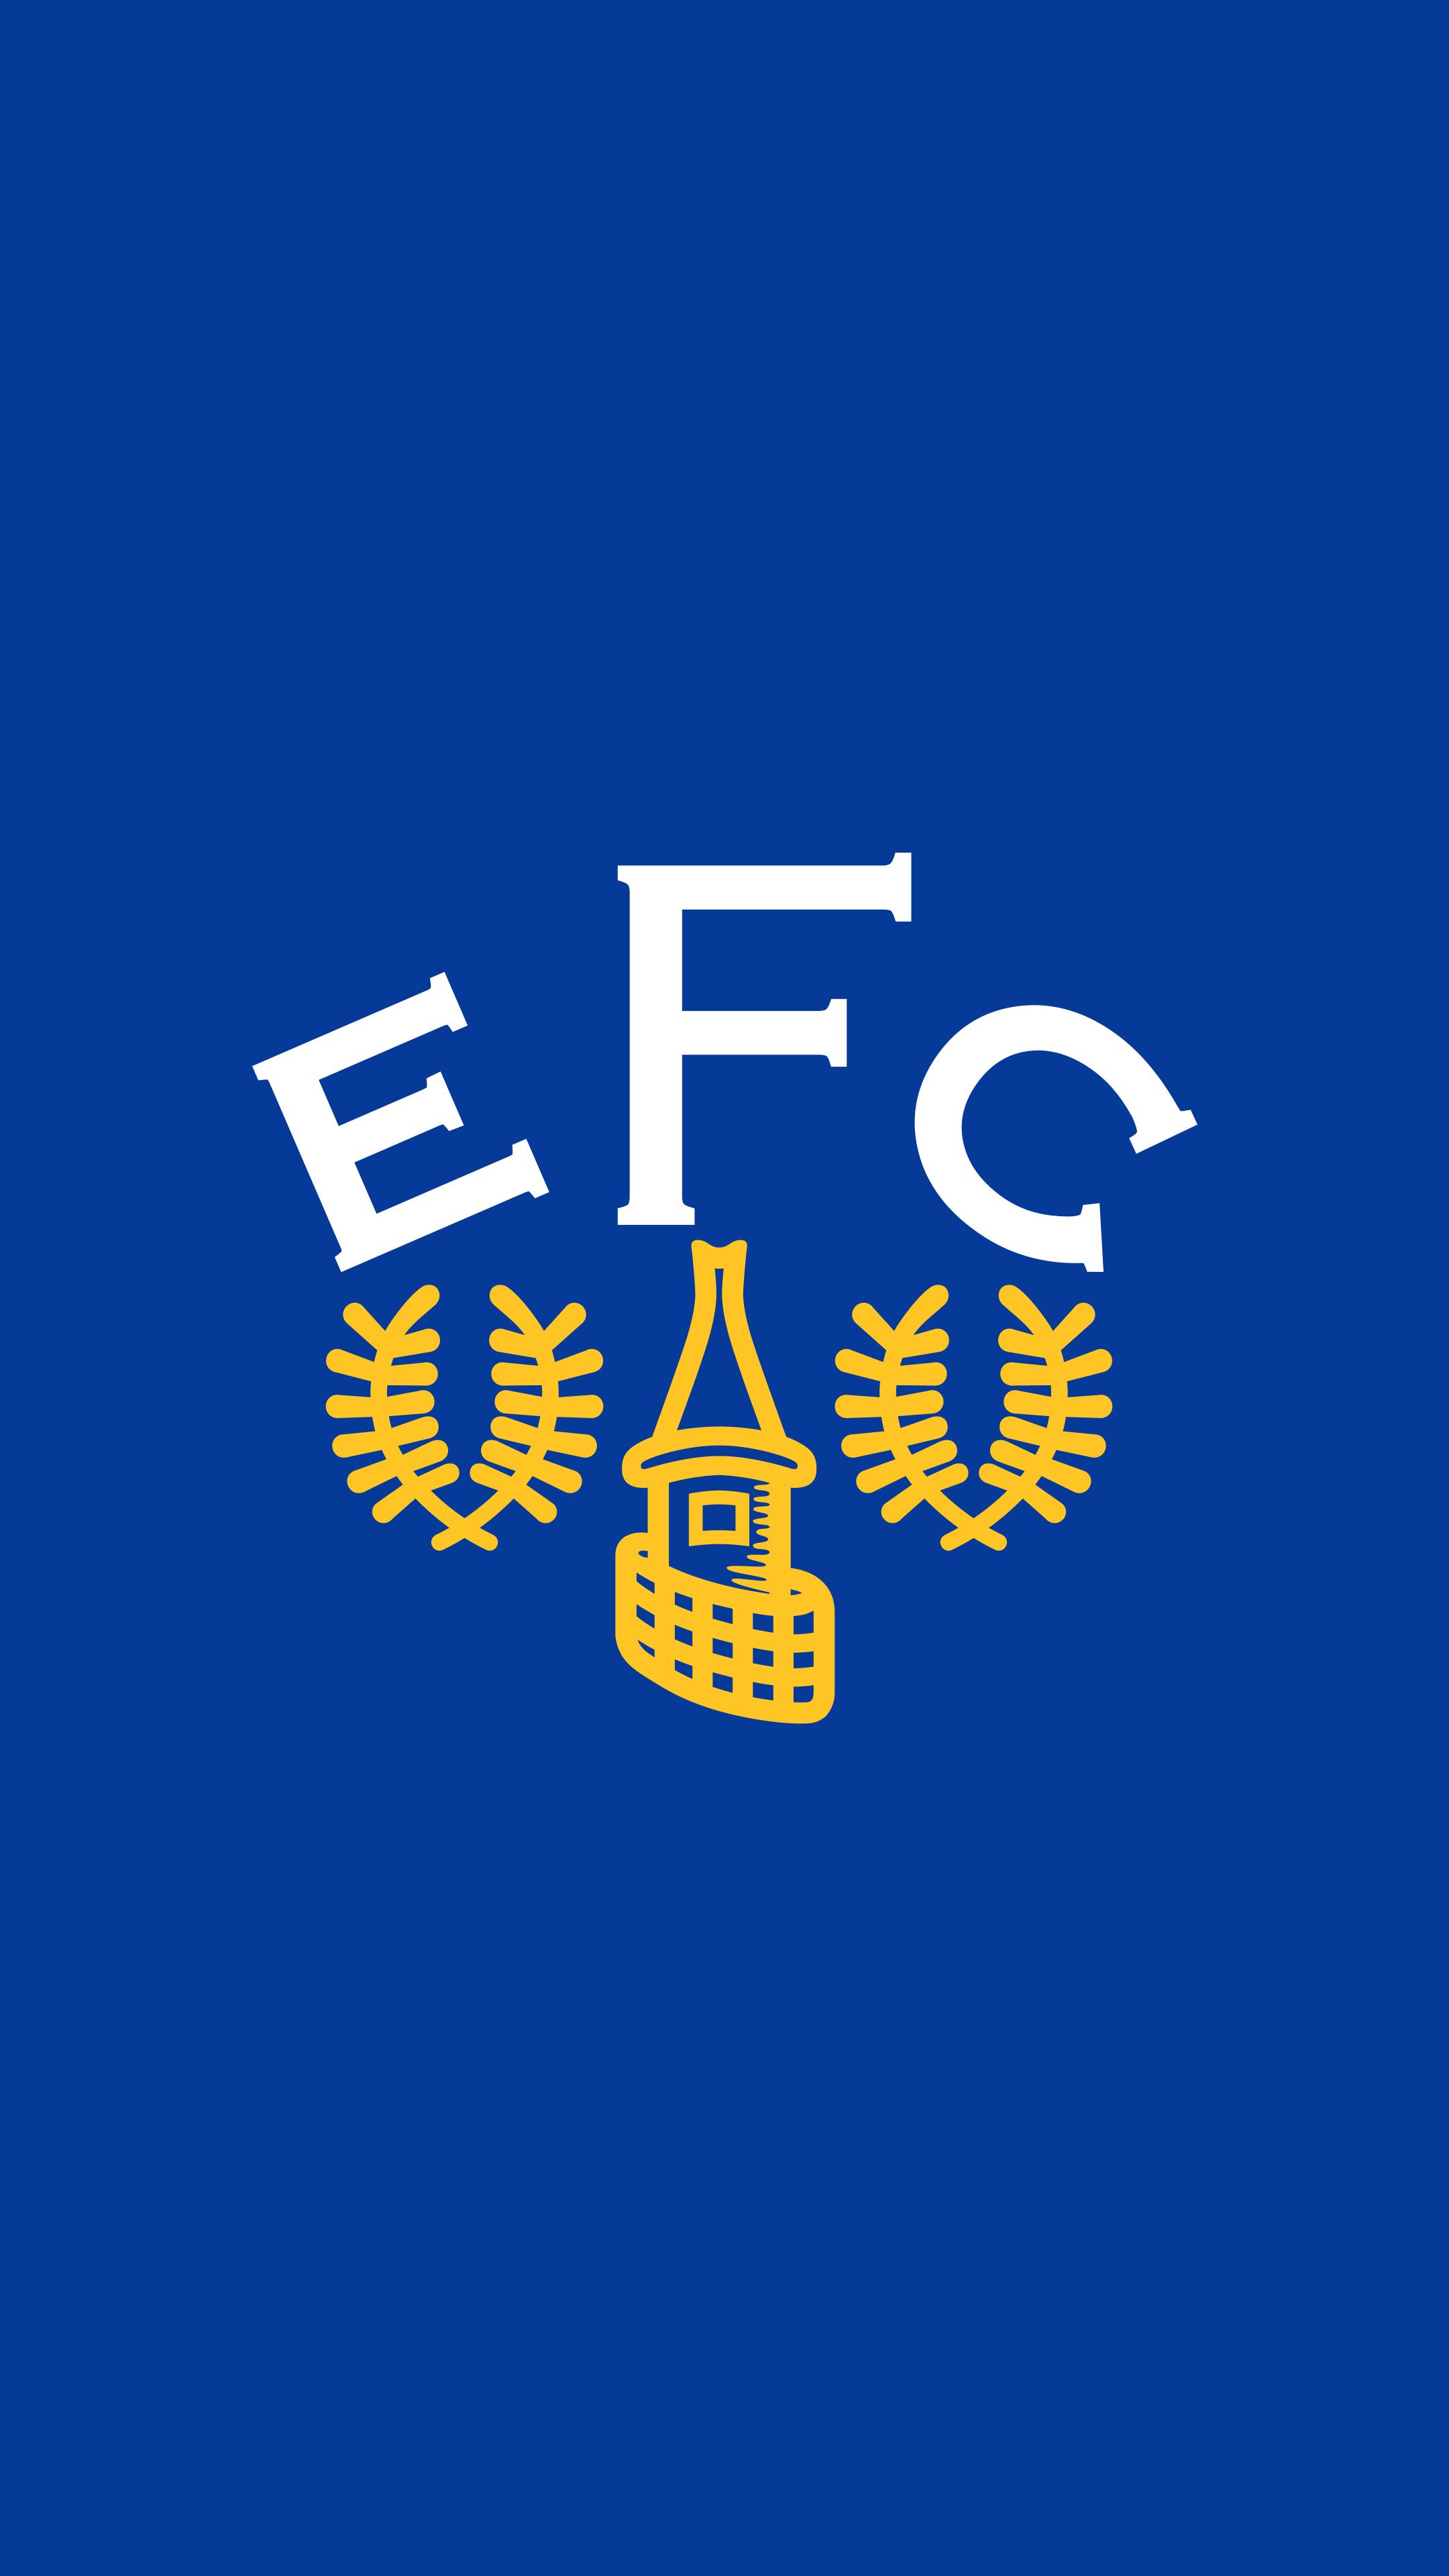 Pin on Football Club & National Team Logos